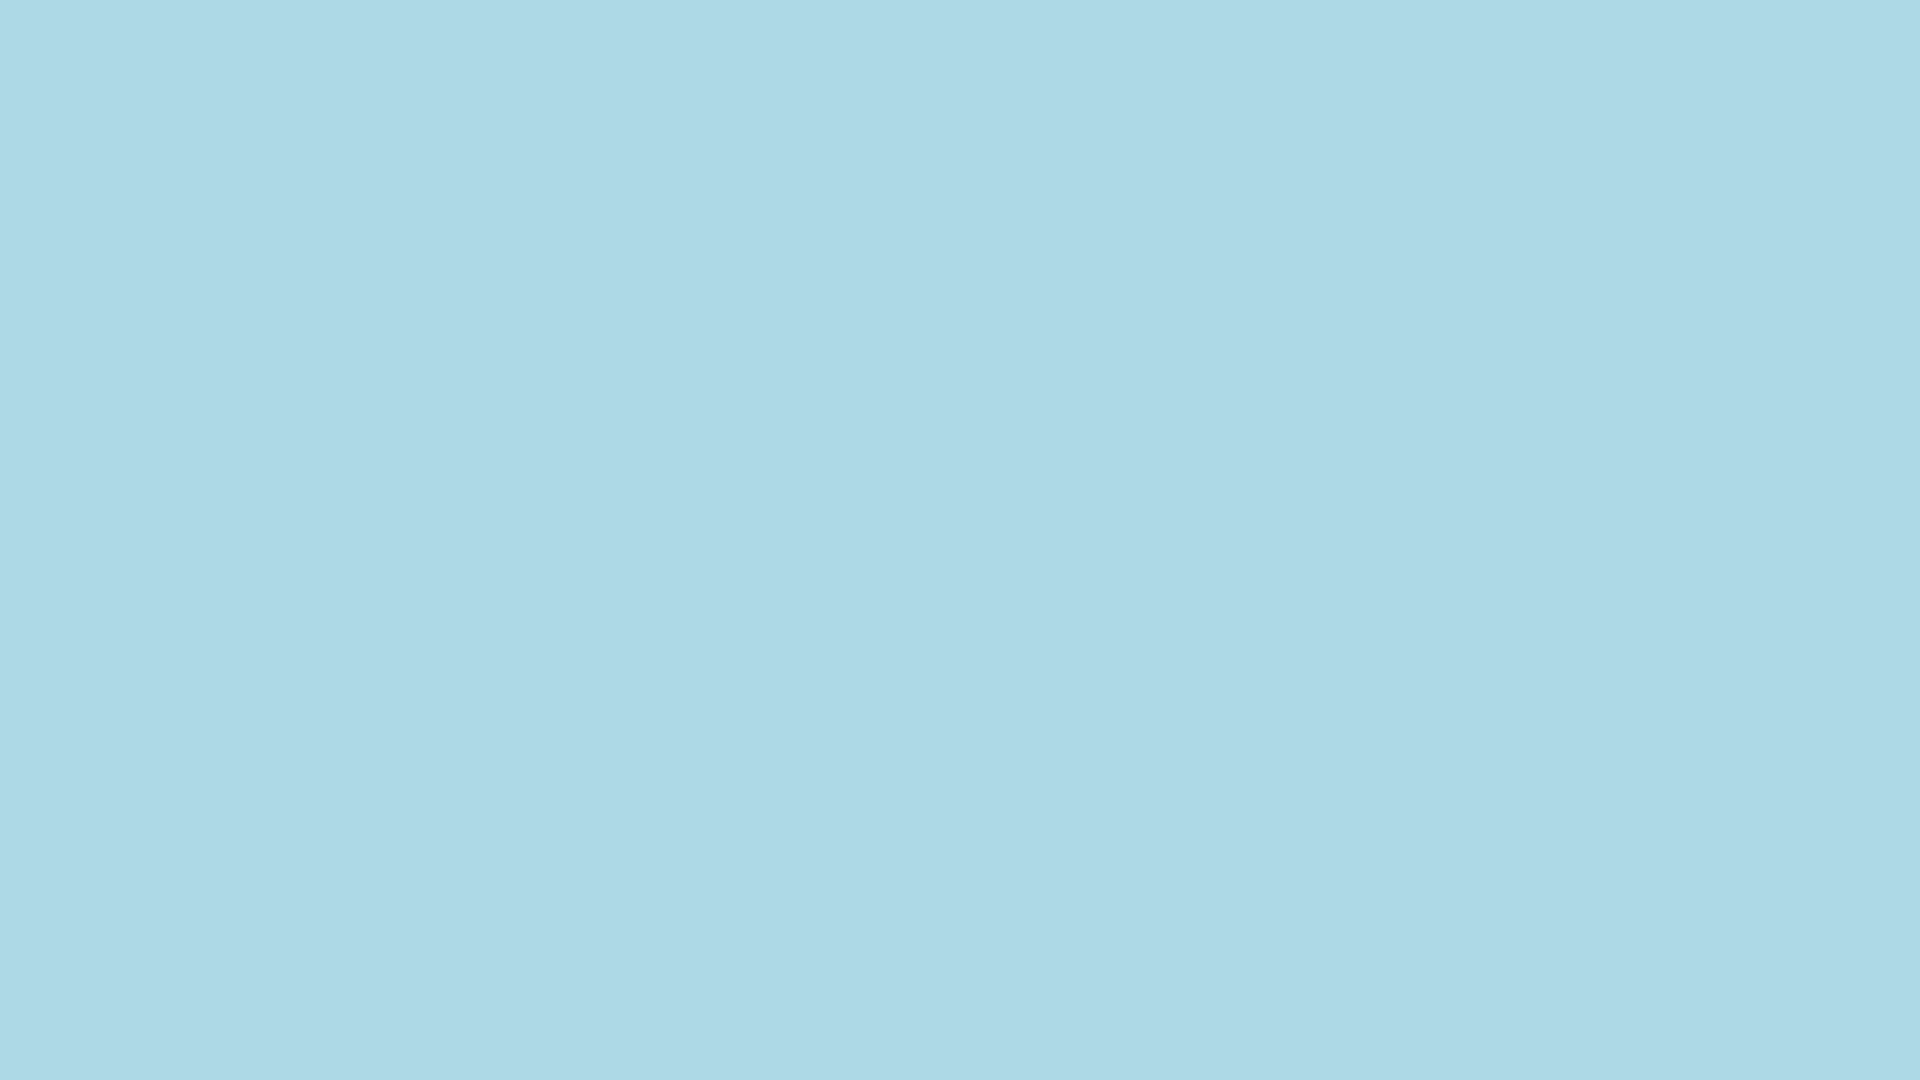 19202151080lightbluesolidcolorbackground